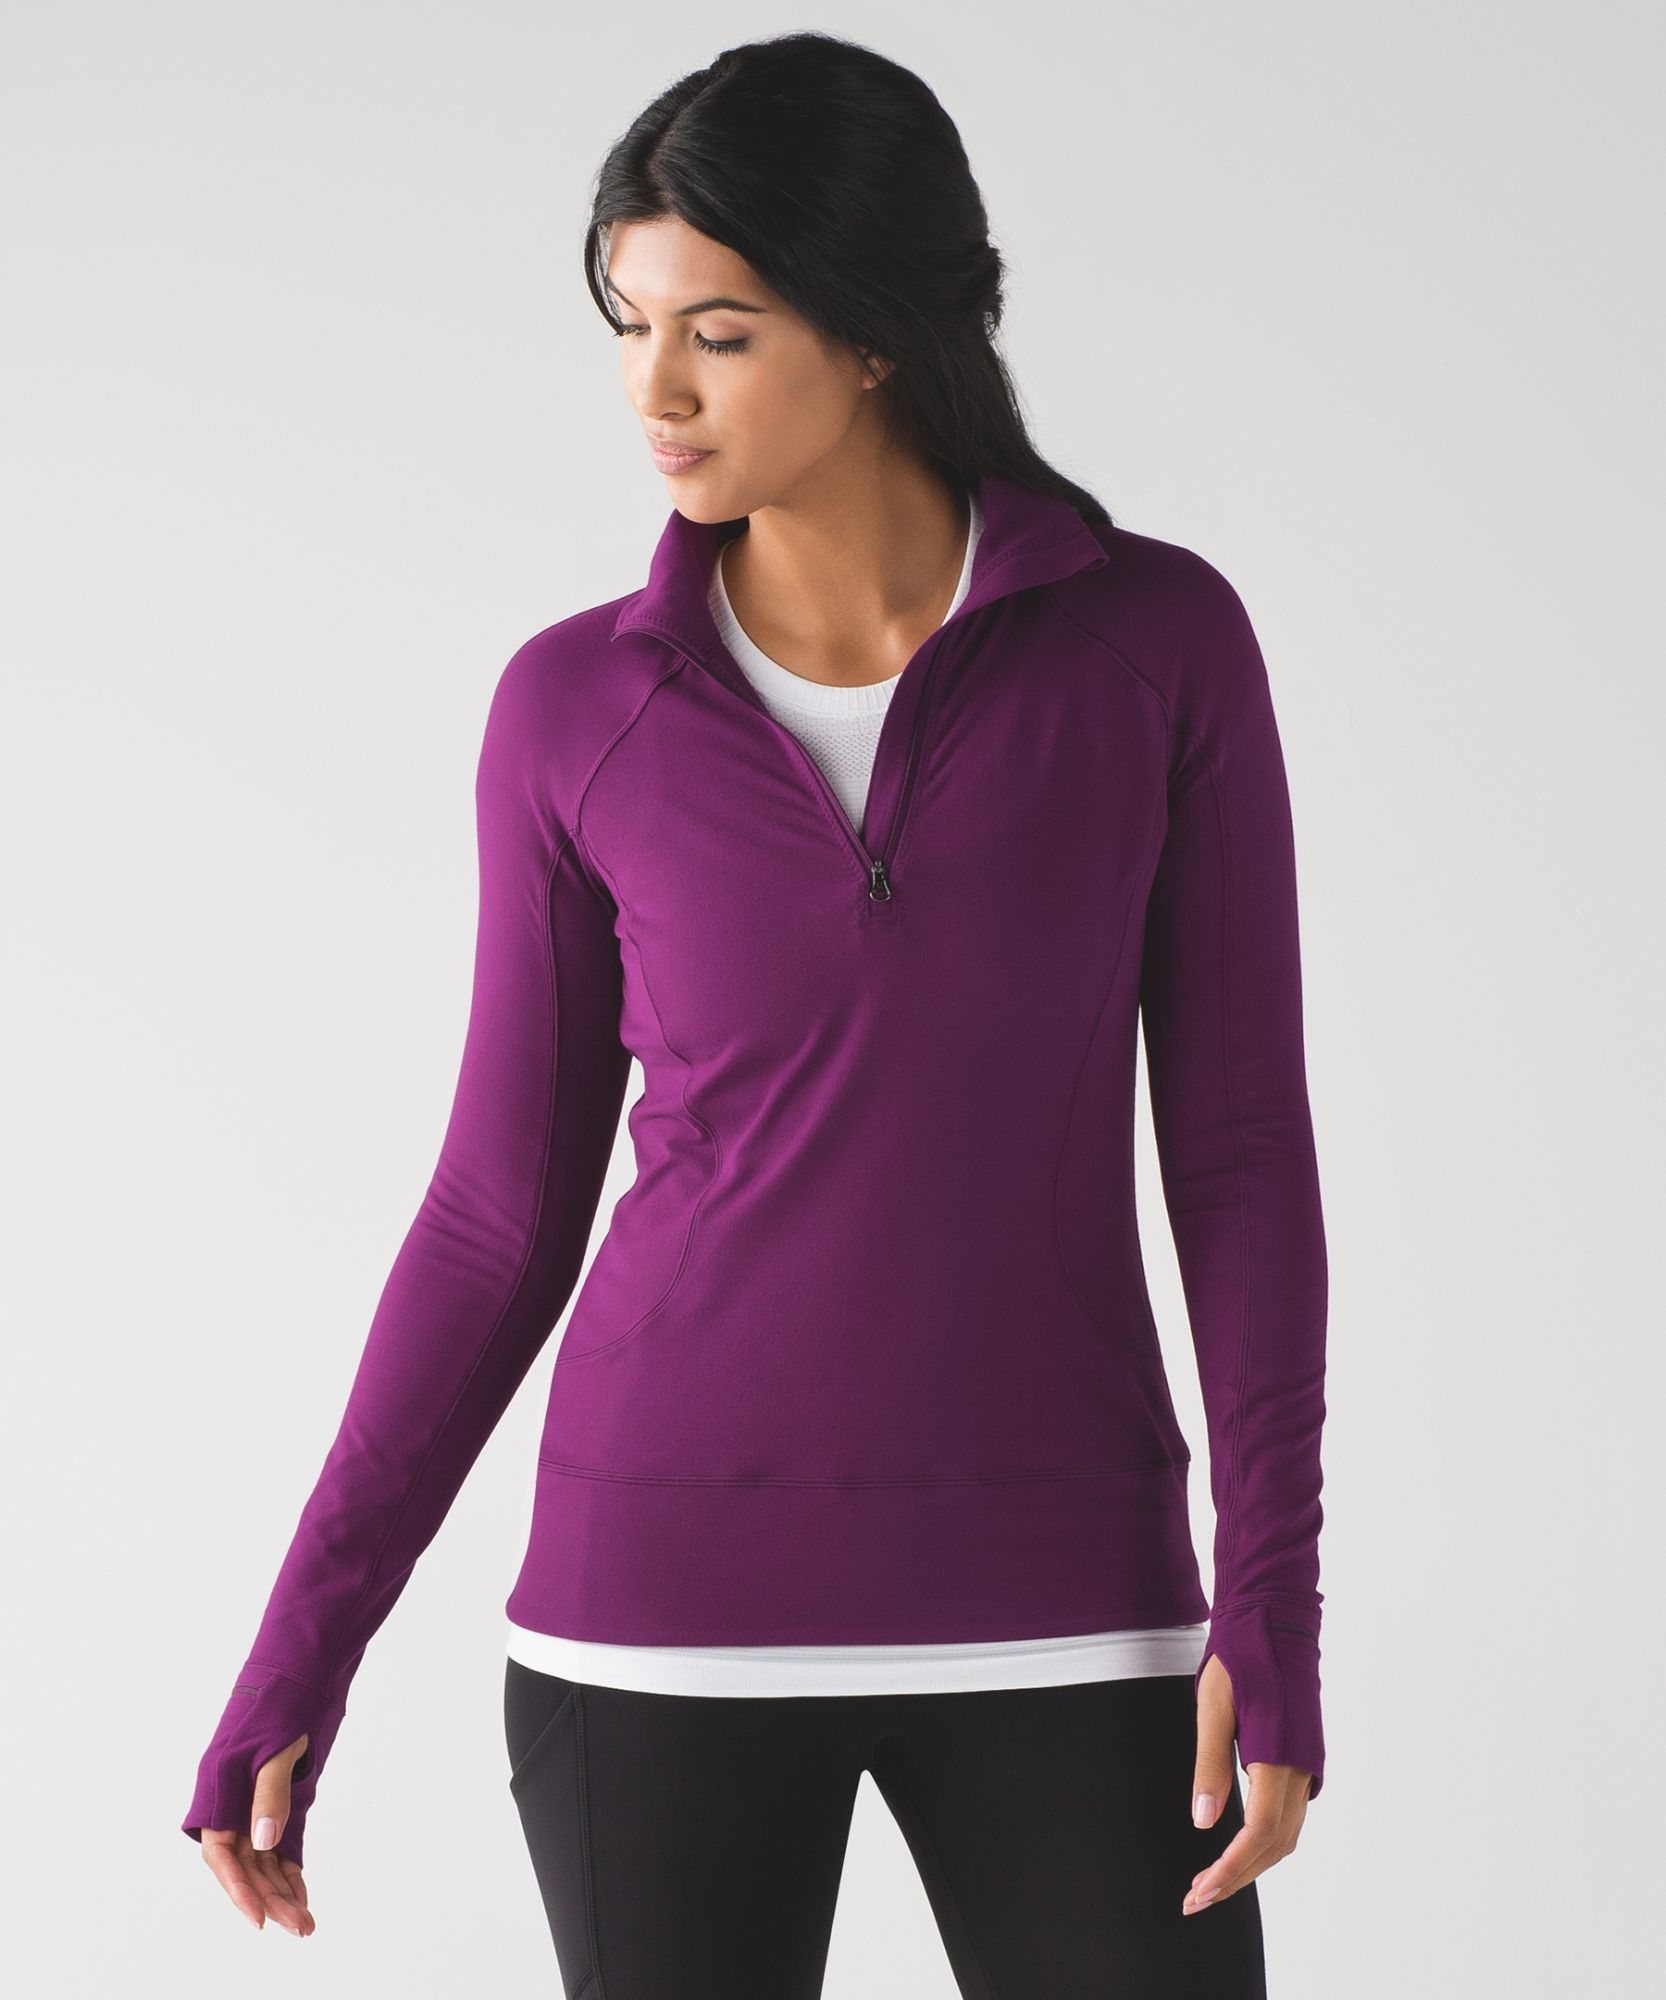 623802b6ee319 Women s Long Sleeve Running Top - Rush Hour 1 2 Zip - lululemon chilled  grape